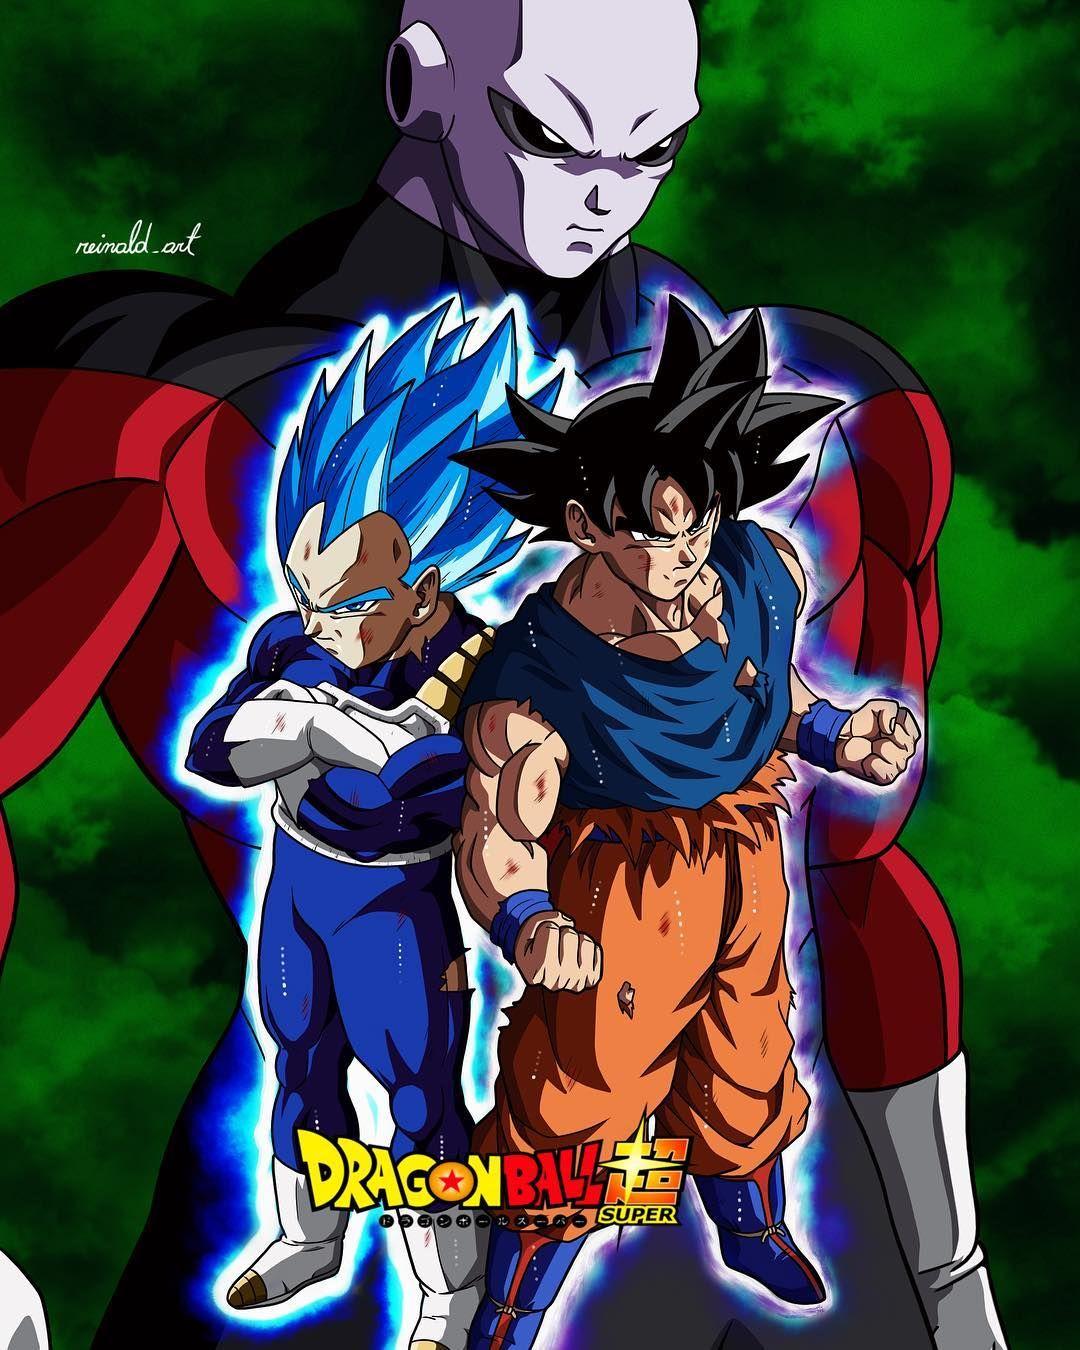 4 918 Me Gusta 82 Comentarios Reinald Art En Instagram Finished Drawing Goku And Vegeta Ultra Instin Dragon Ball Super Art Dragon Ball Z Dragon Ball Art